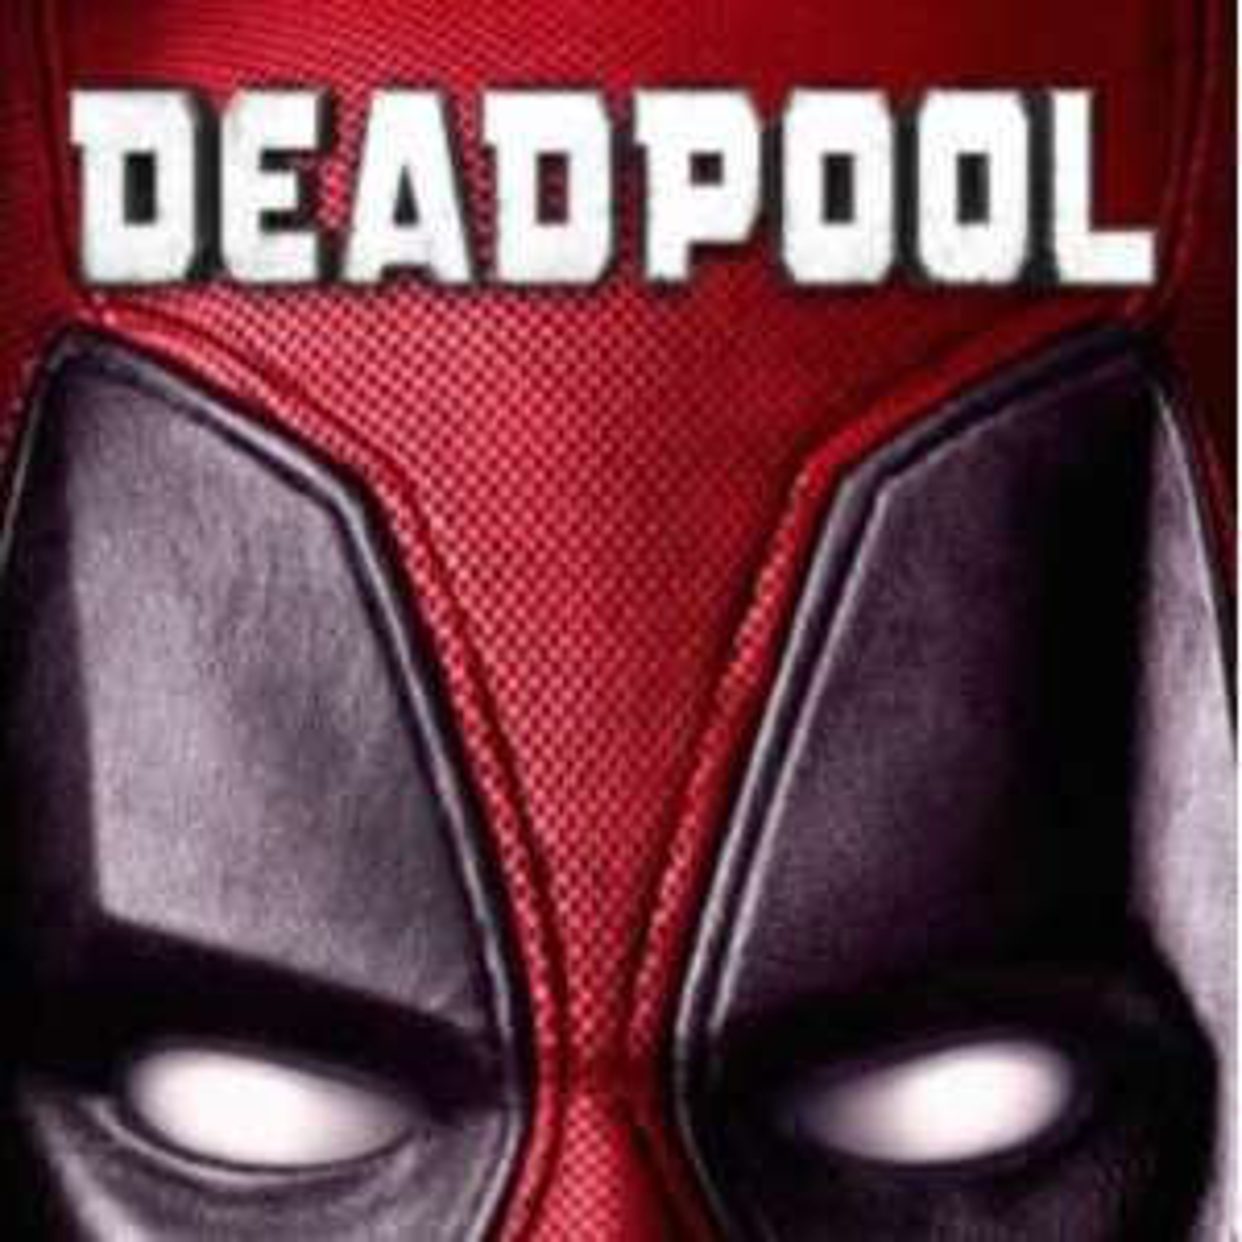 Deadpool 4K HDR £6.99 @ iTunes